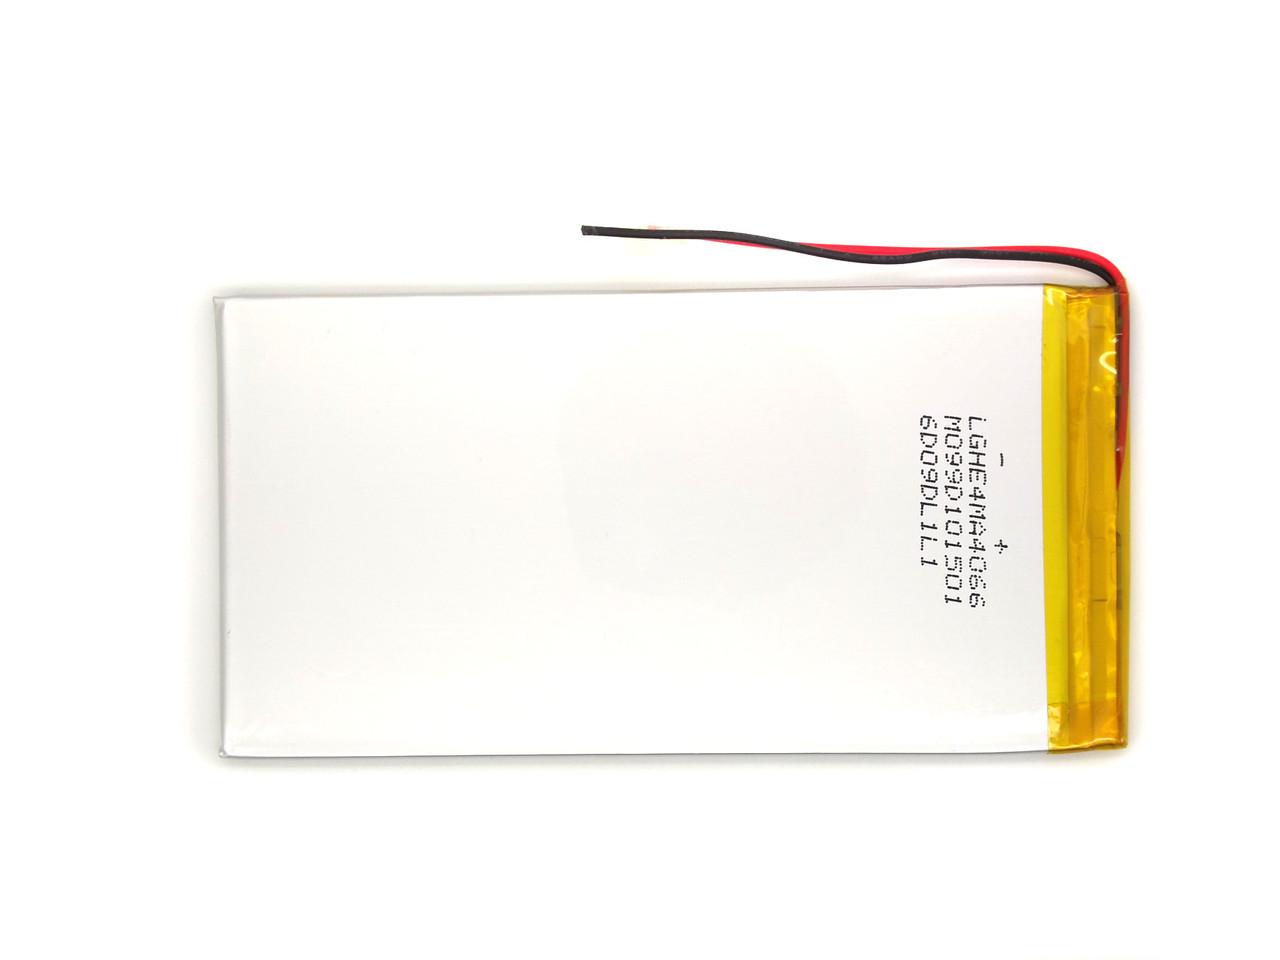 Аккумулятор 5000mAh 3.7v 3570125 Li-Po, для планшетов